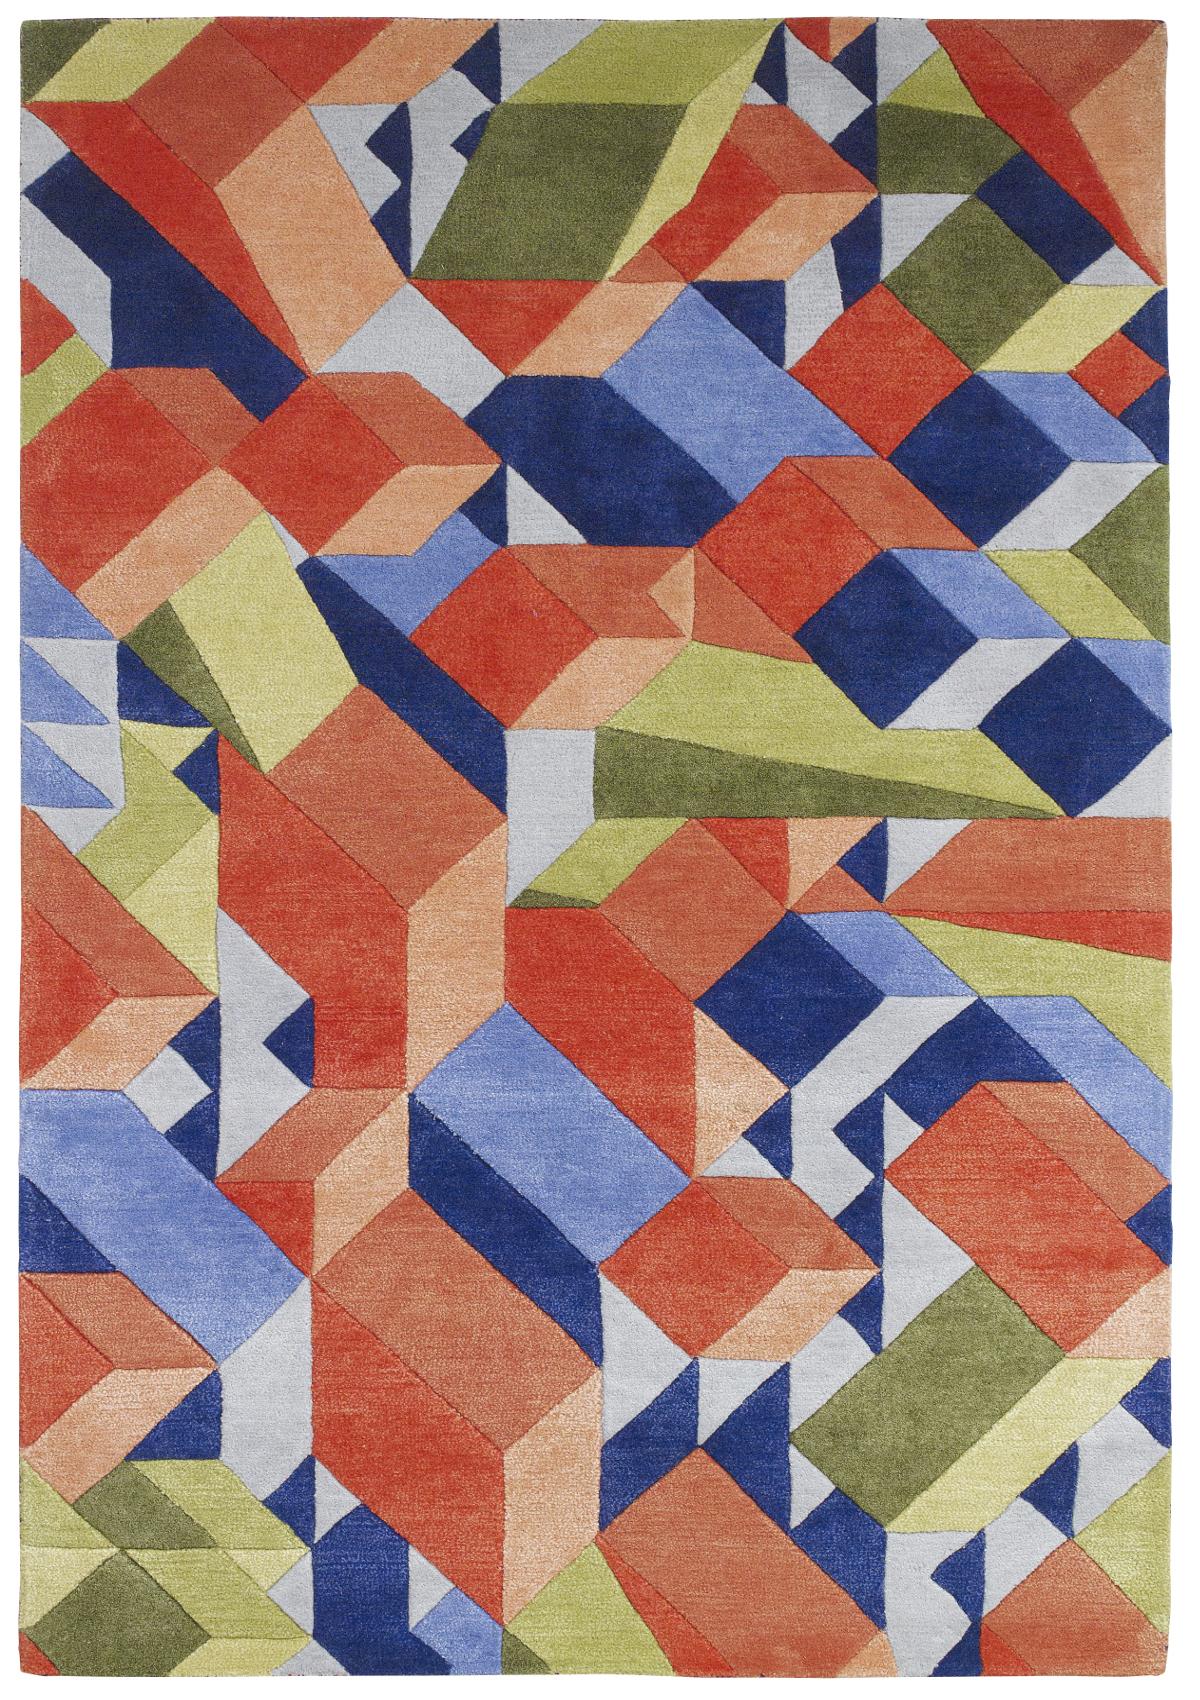 geometric rug pattern. Designer Wool Blend Geometric Rug Adam Daly Multi Colour Modern Hand Tufted Mat | EBay Pattern